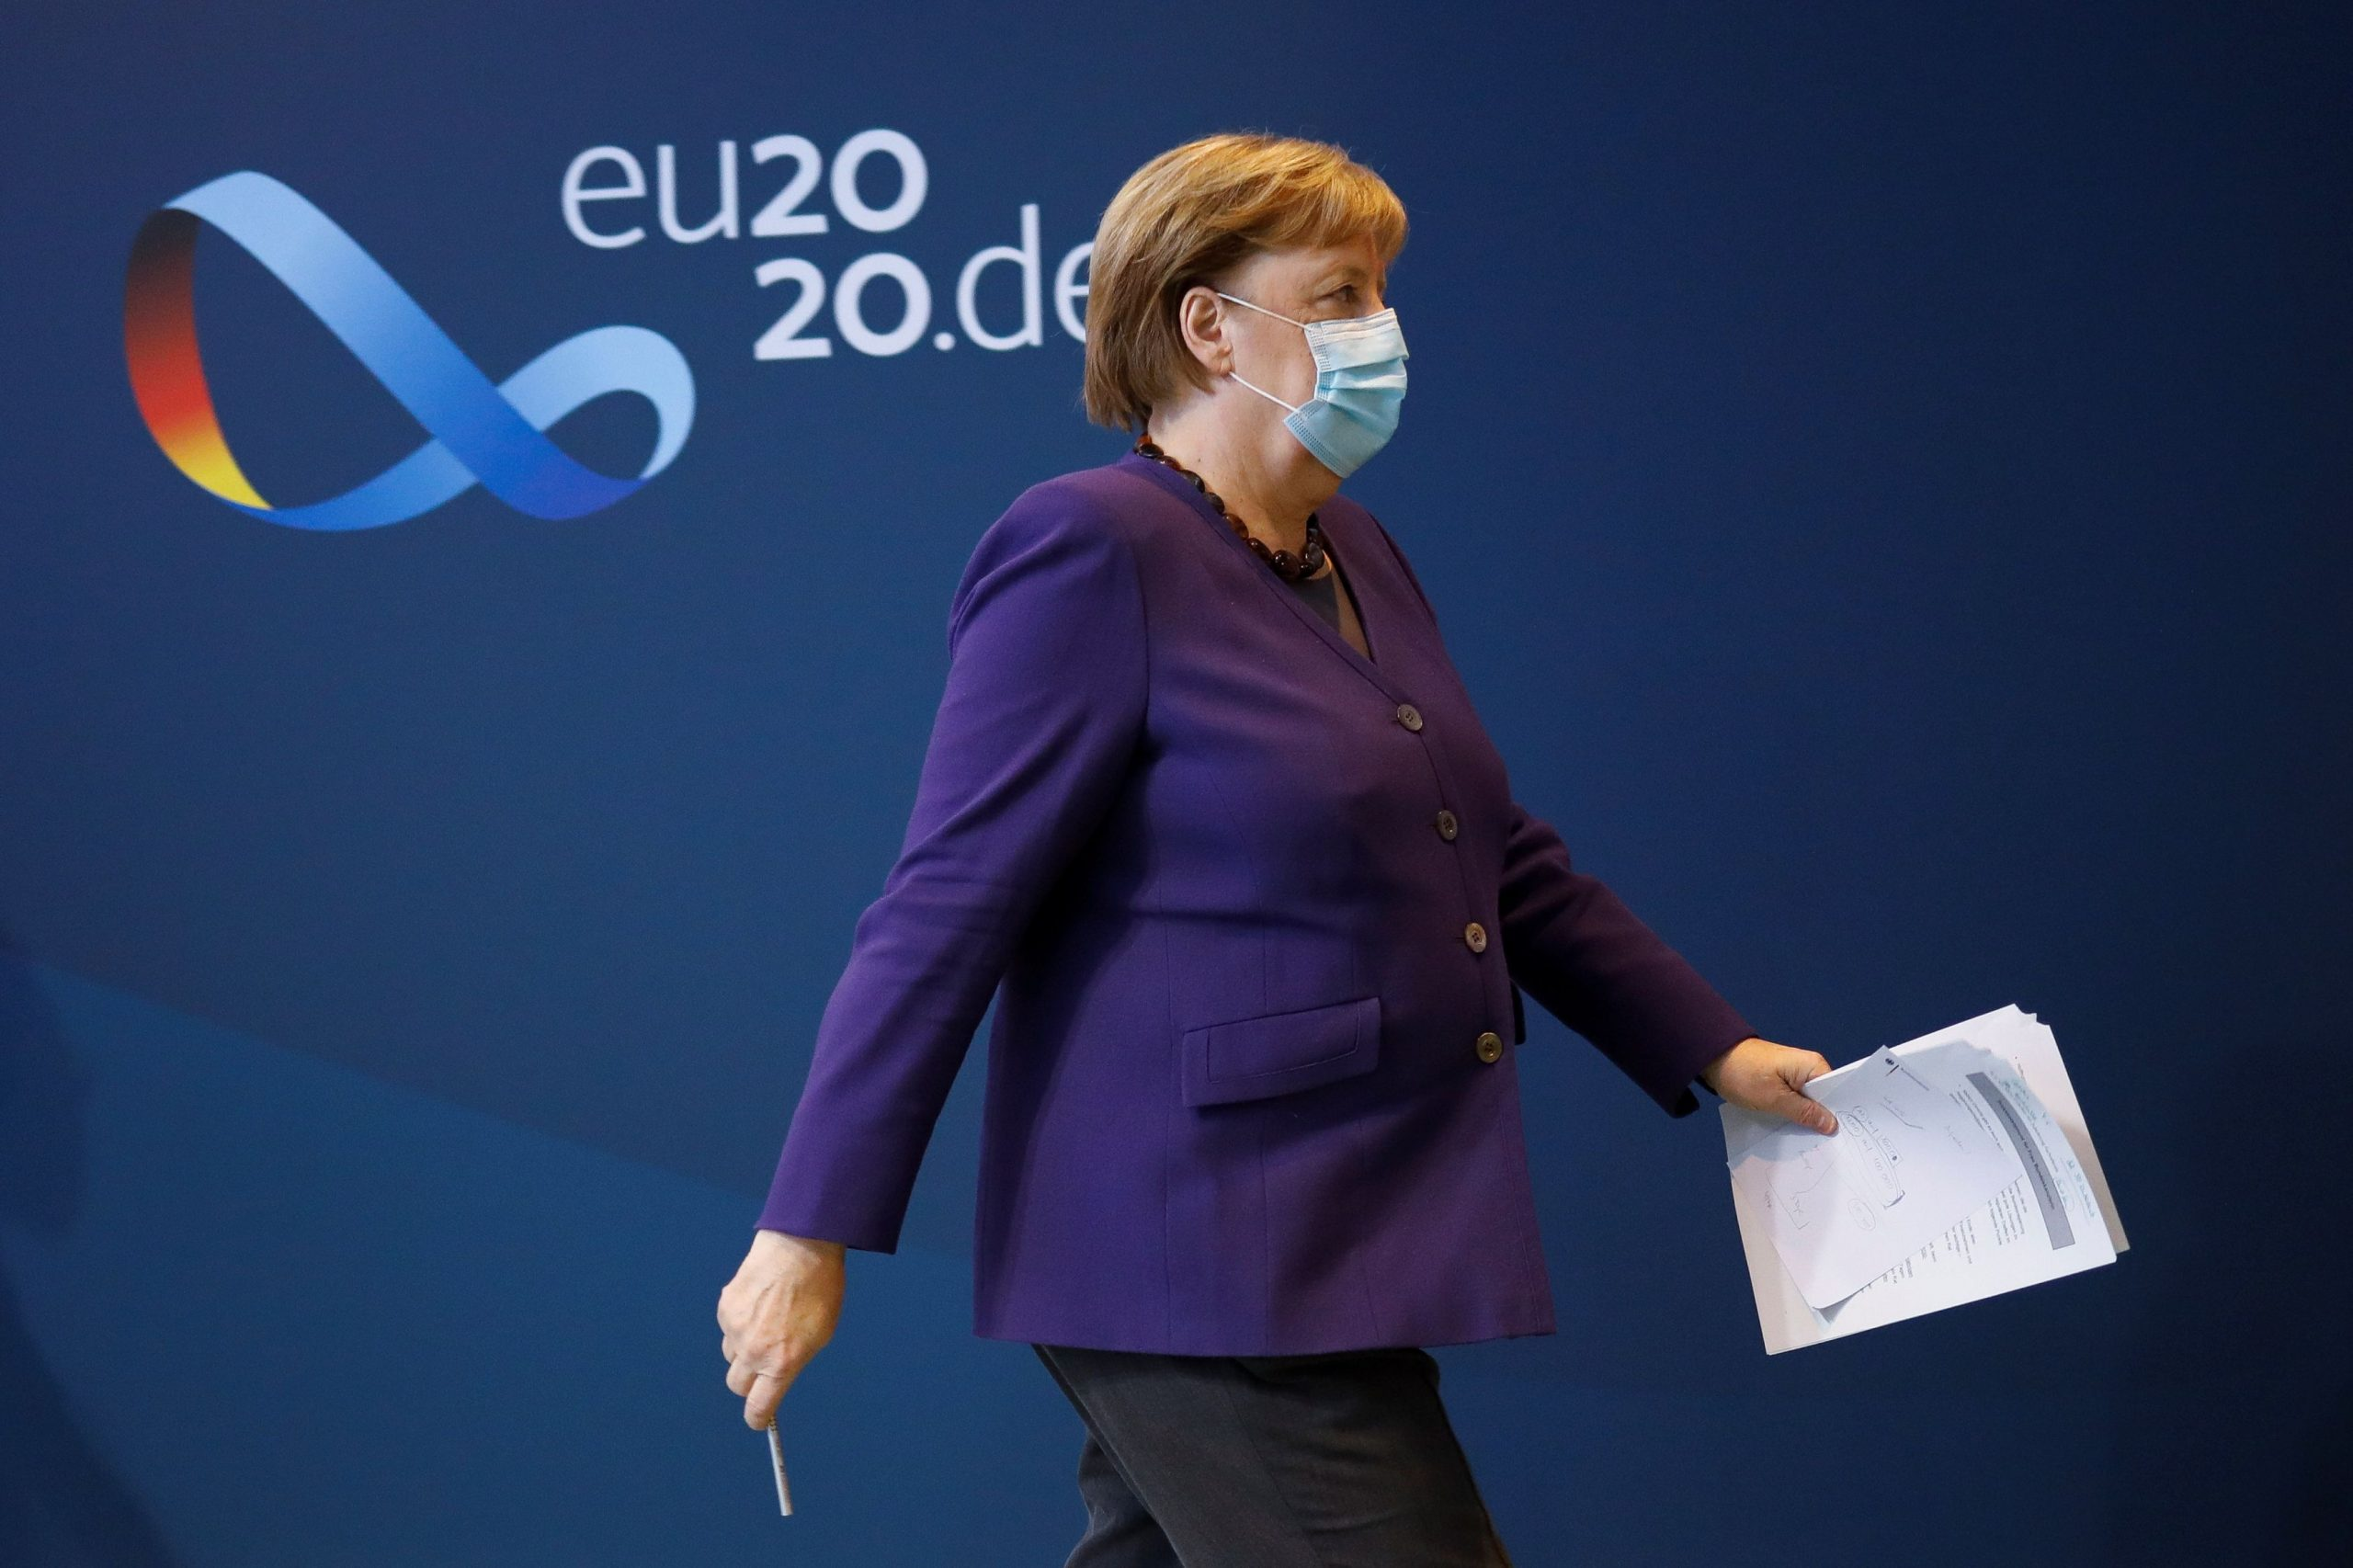 foto: Markus Schreiber/Pool via REUTERS